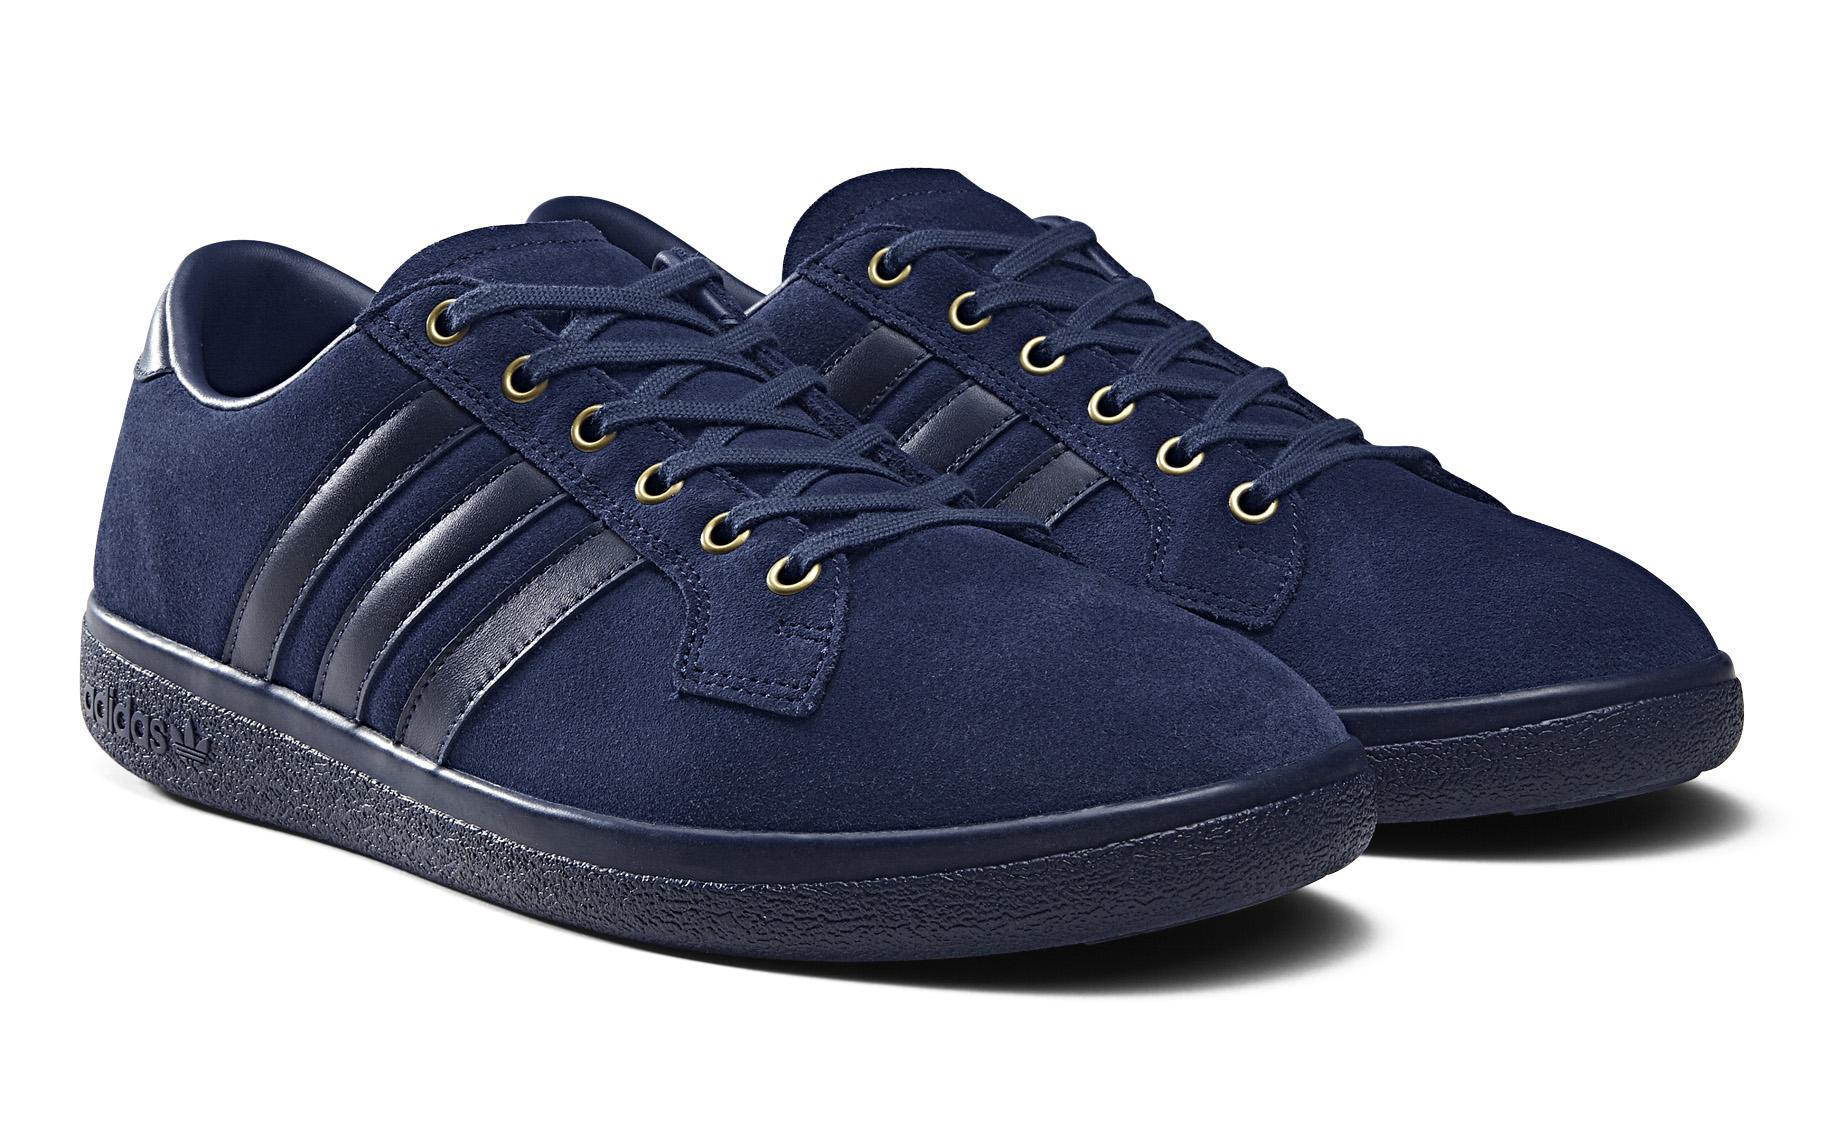 Adidas Spezial Bulhill Navy